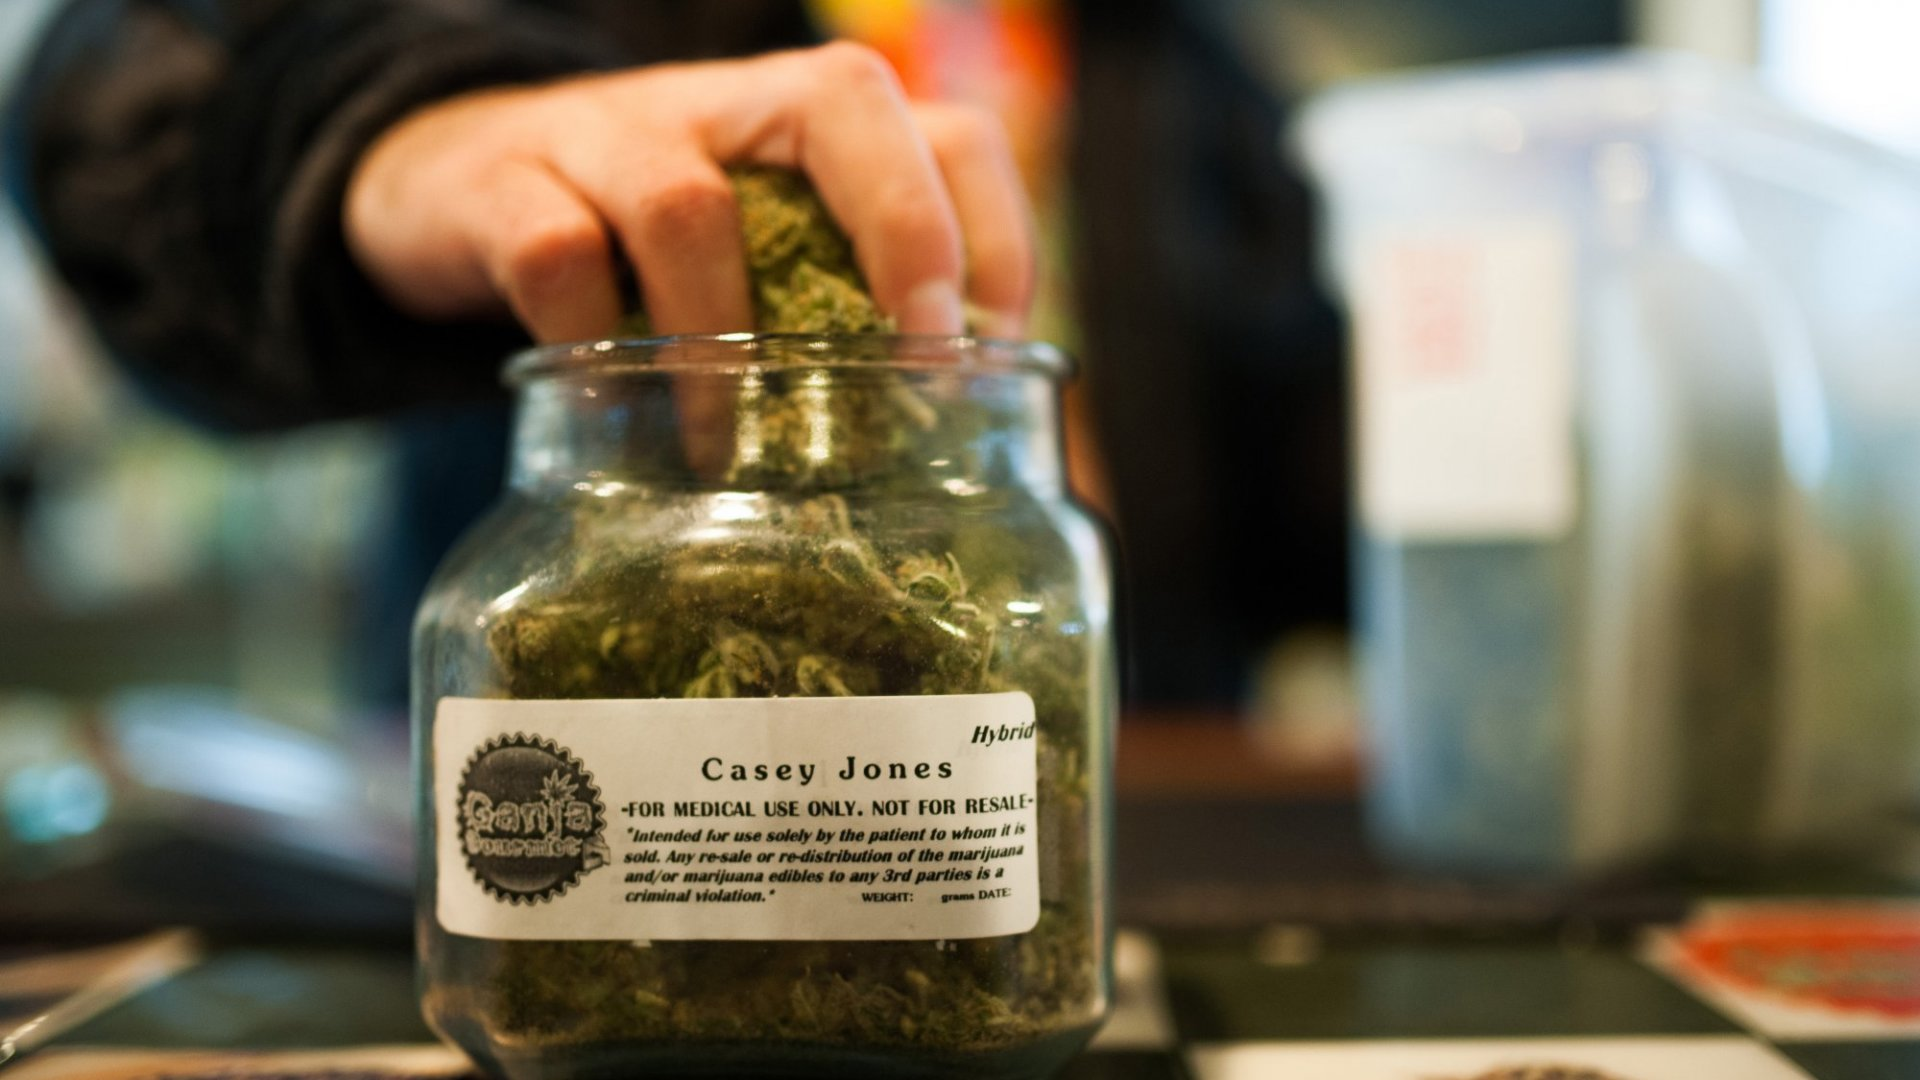 Marijuana Is Now Legal Inside Certain Denver Businesses